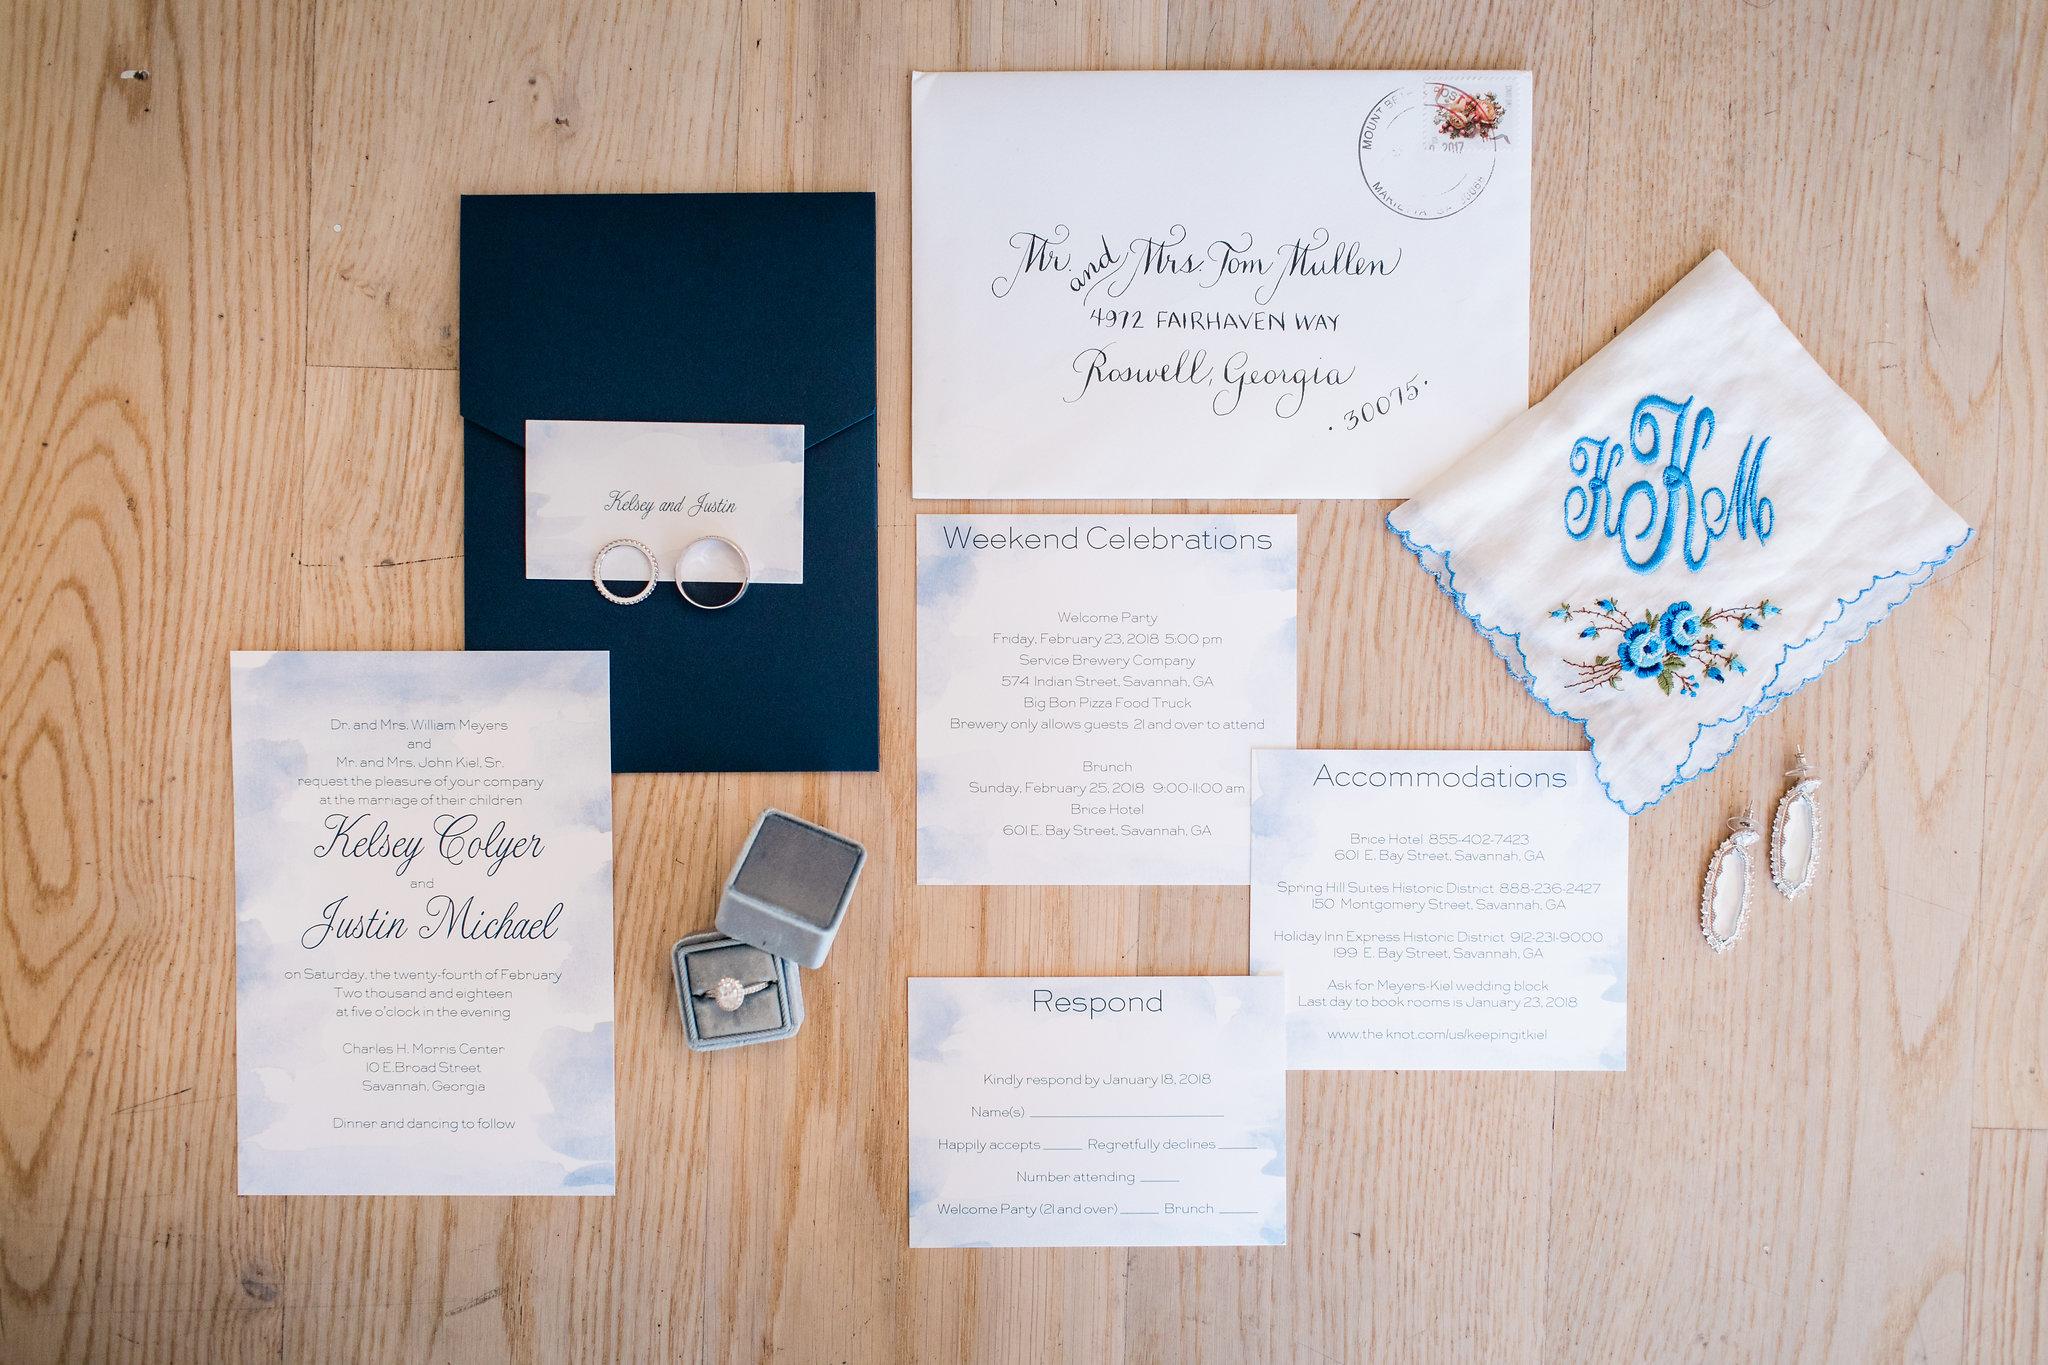 apt-b-photography-Savannah-wedding-photographer-savannah-engagement-photographer-historic-savannah-engagement-charles-h-morris-center-wedding-savannah-weddings-the-brice-hotel-getting-ready-3.JPG